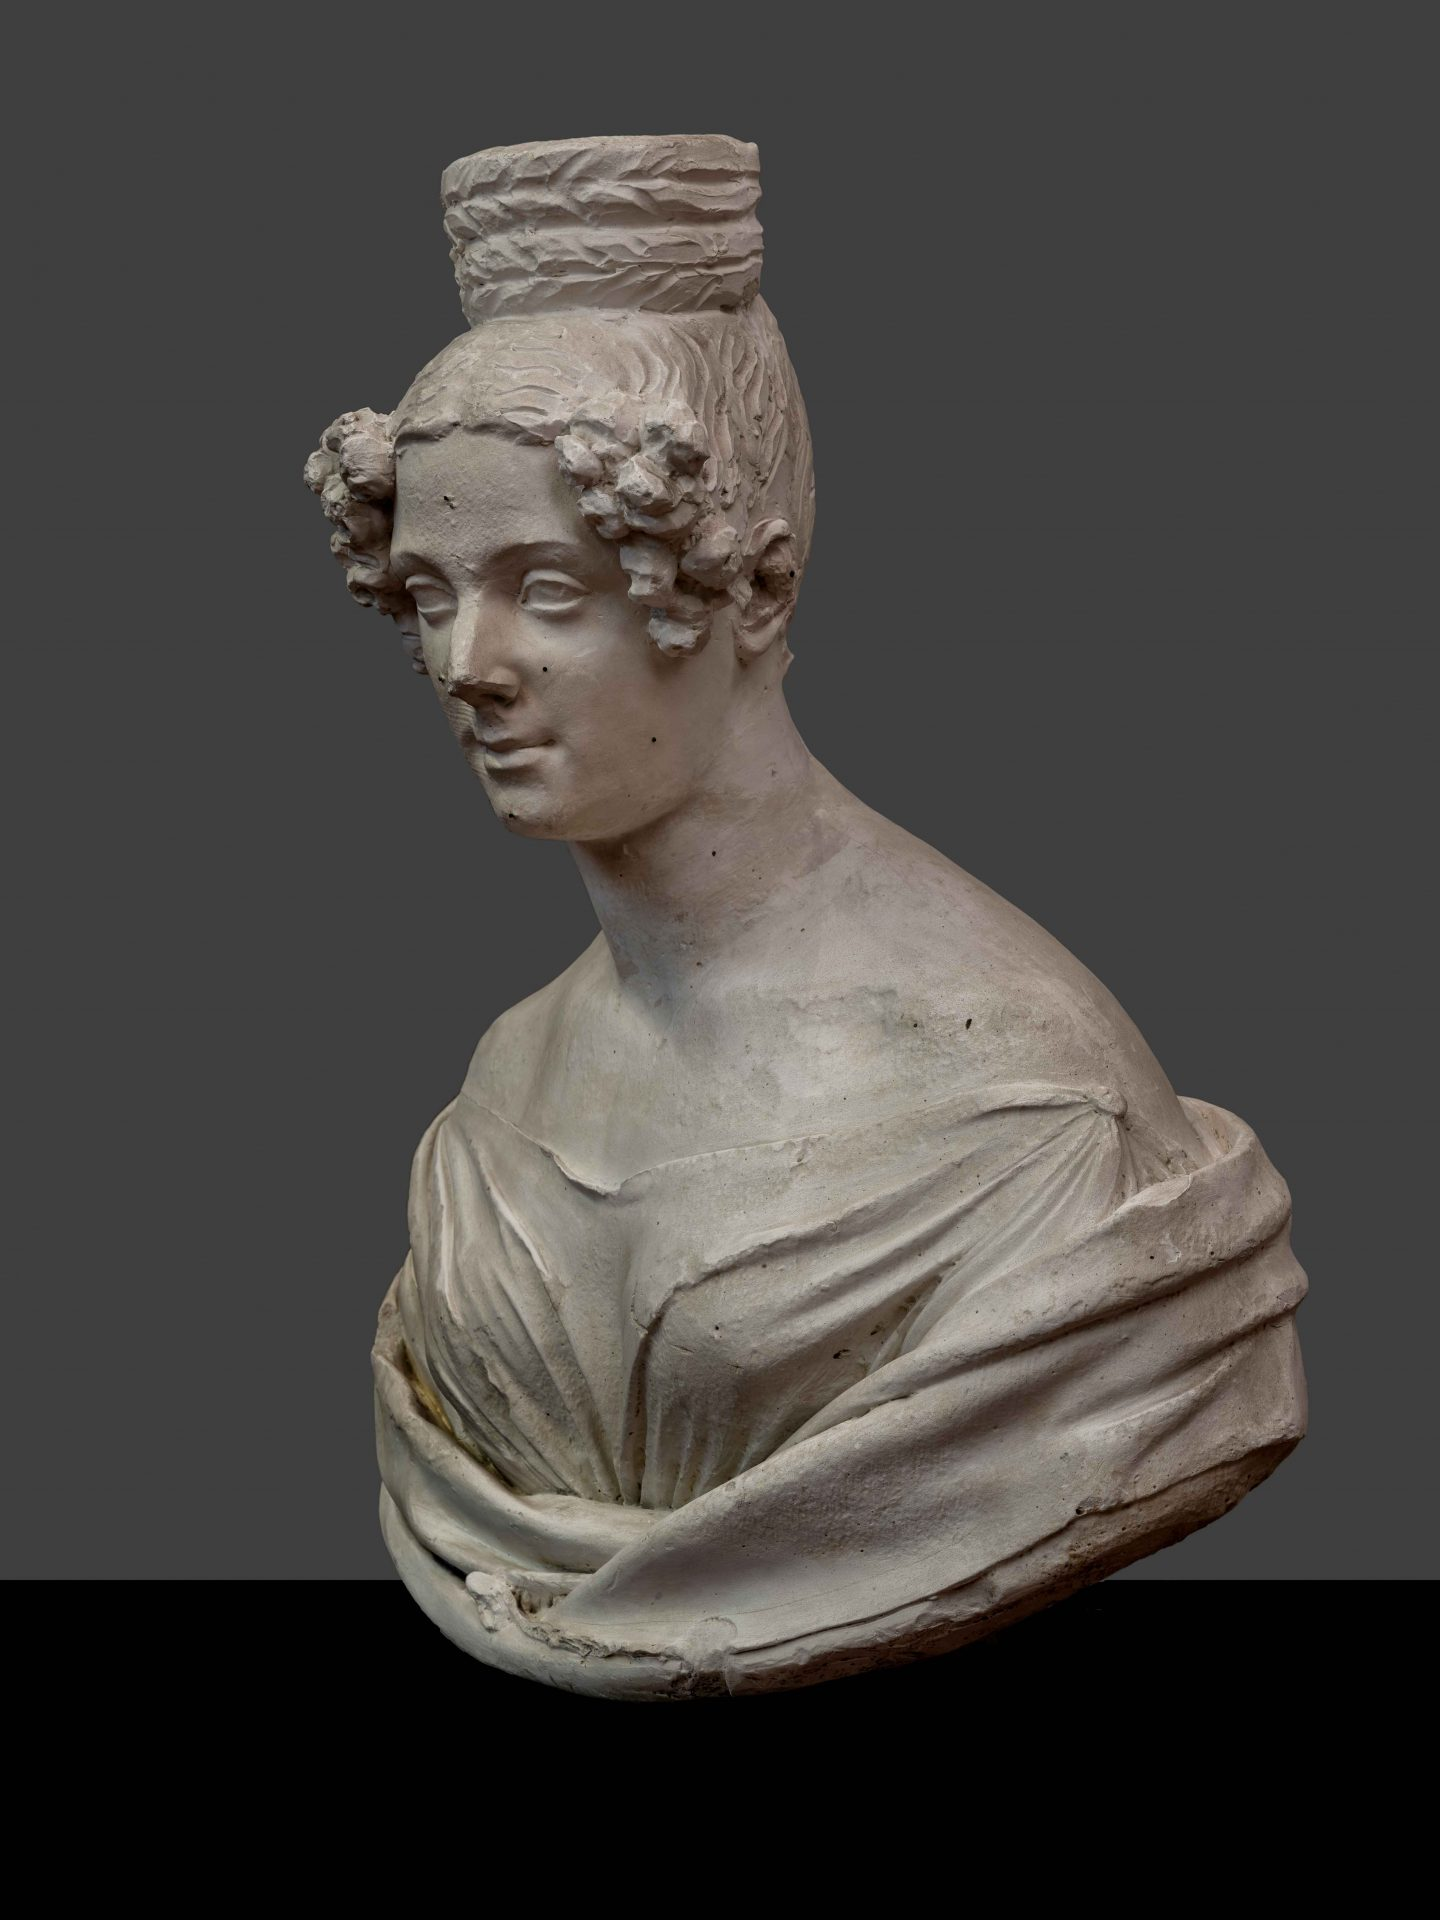 inv. scult. 1551 busto femminile. ph. a. quattrone aqtt0881